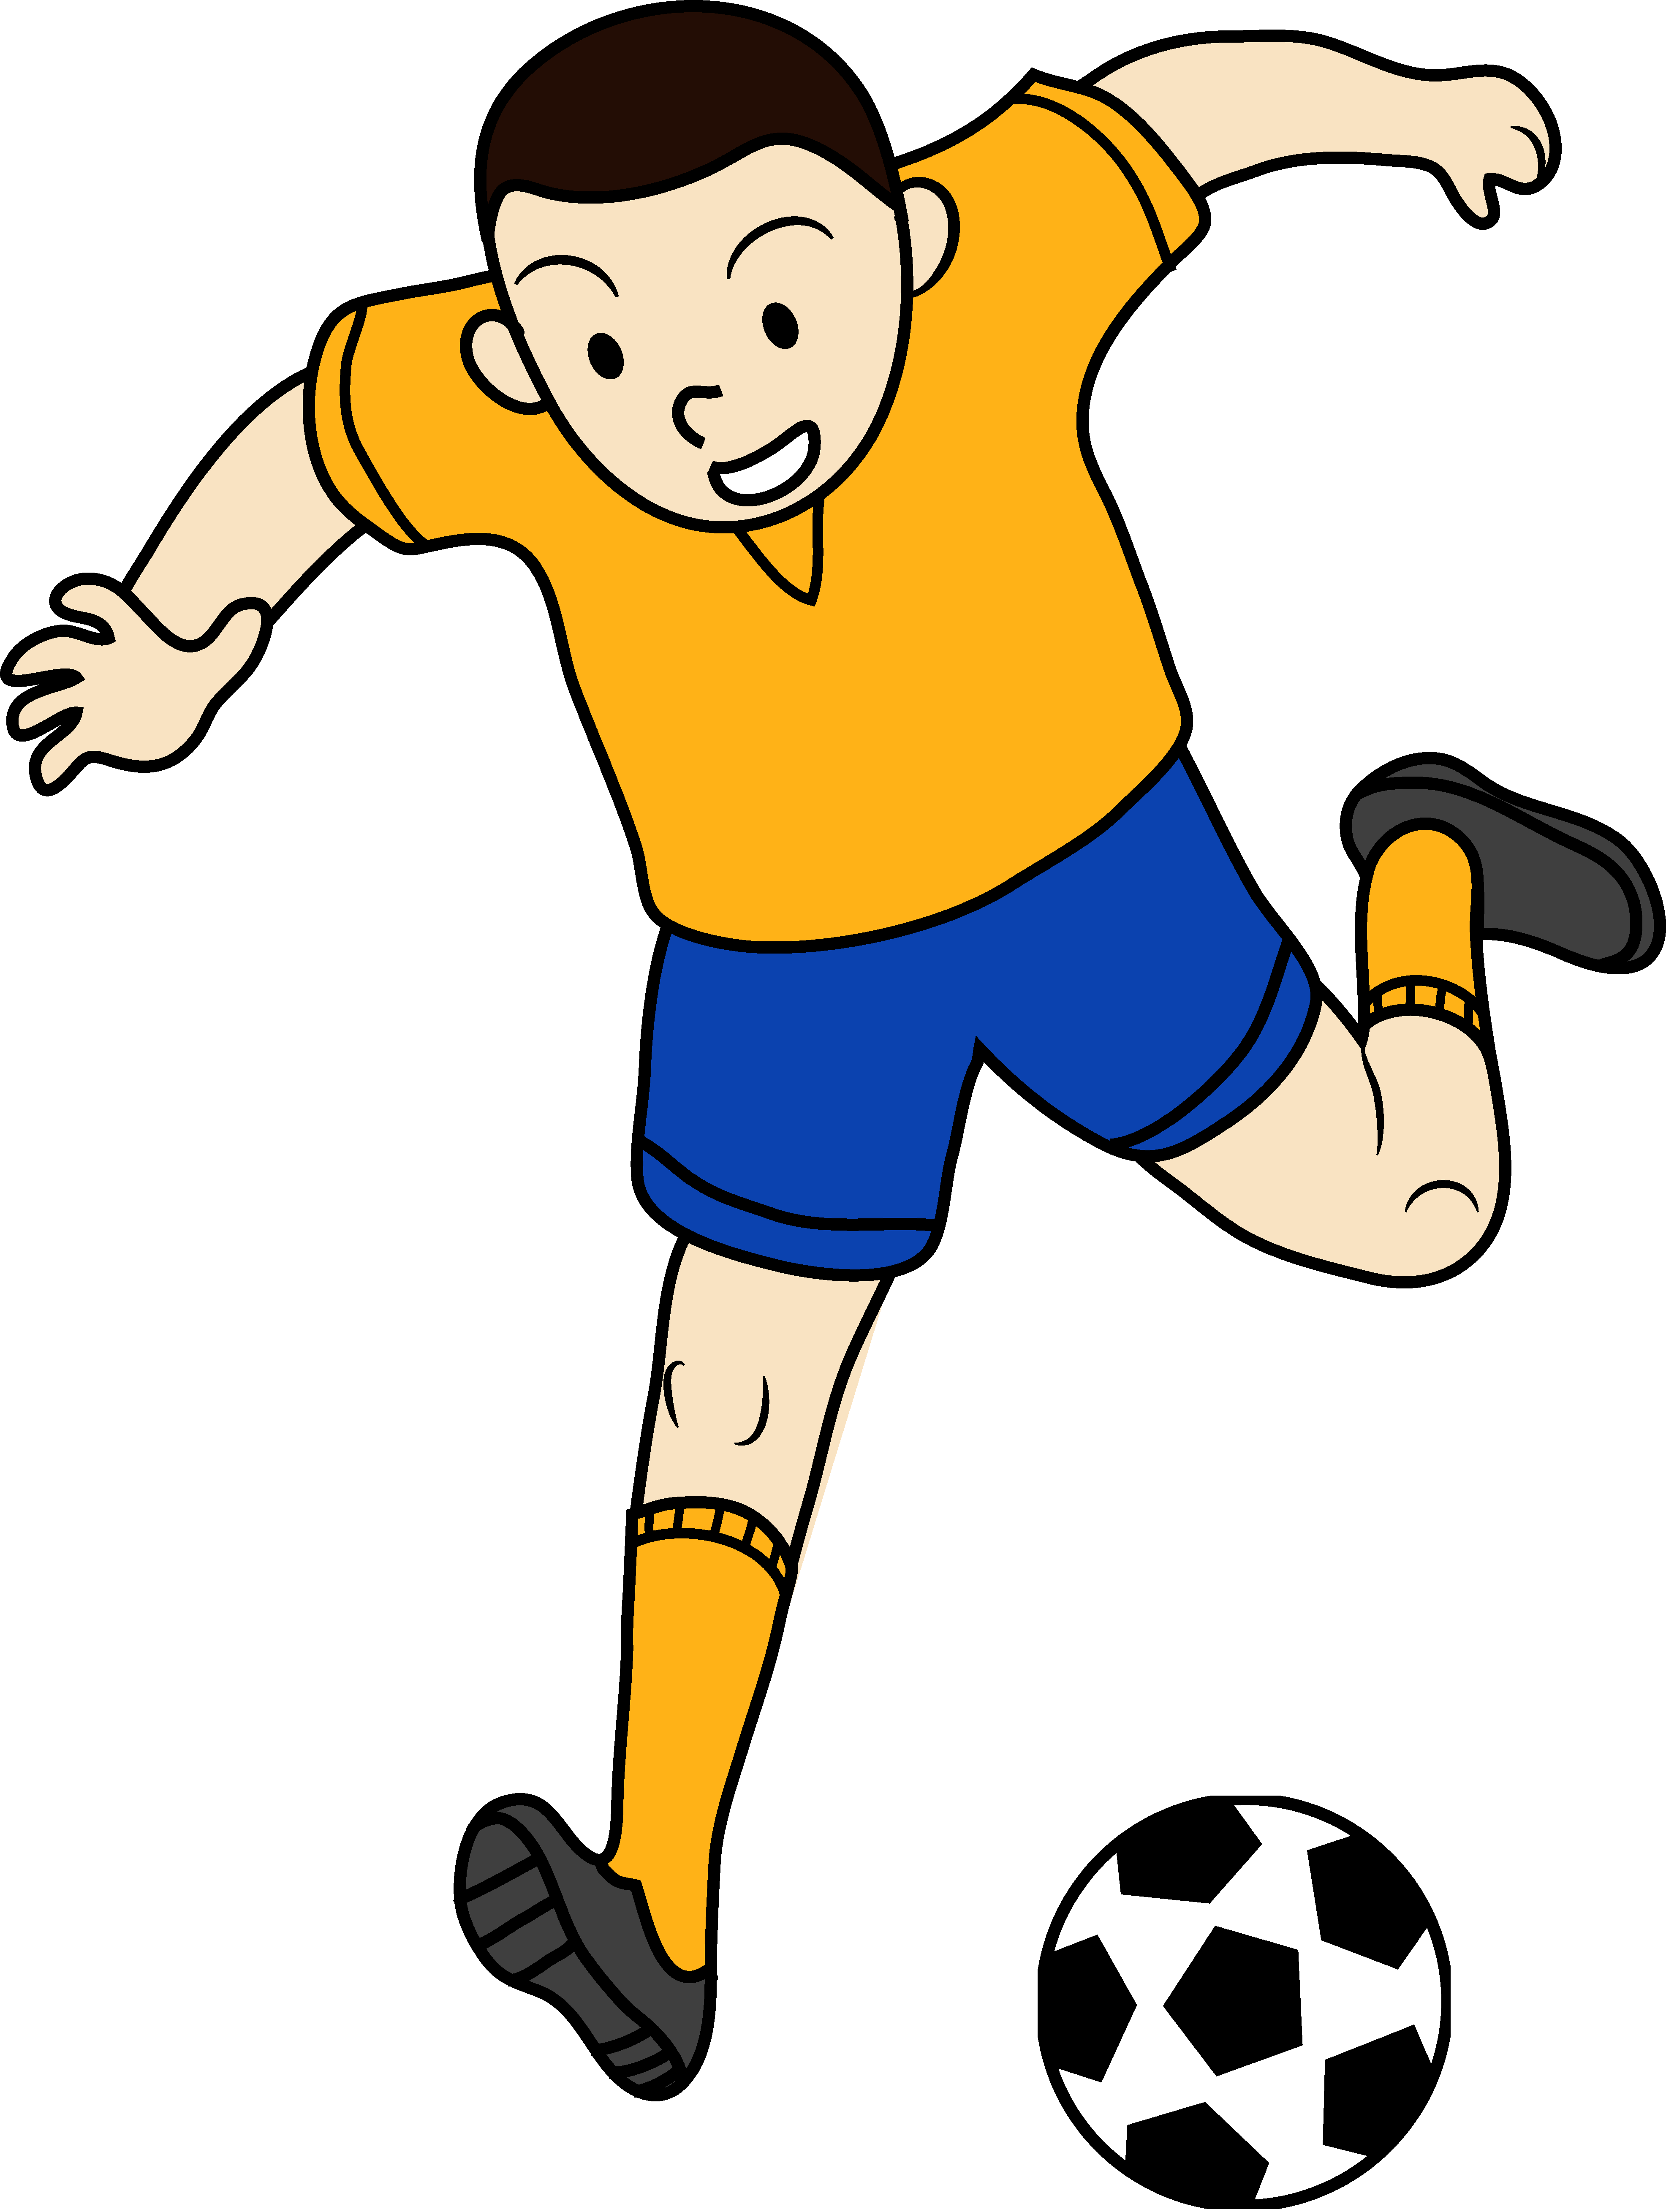 kid football player clipart